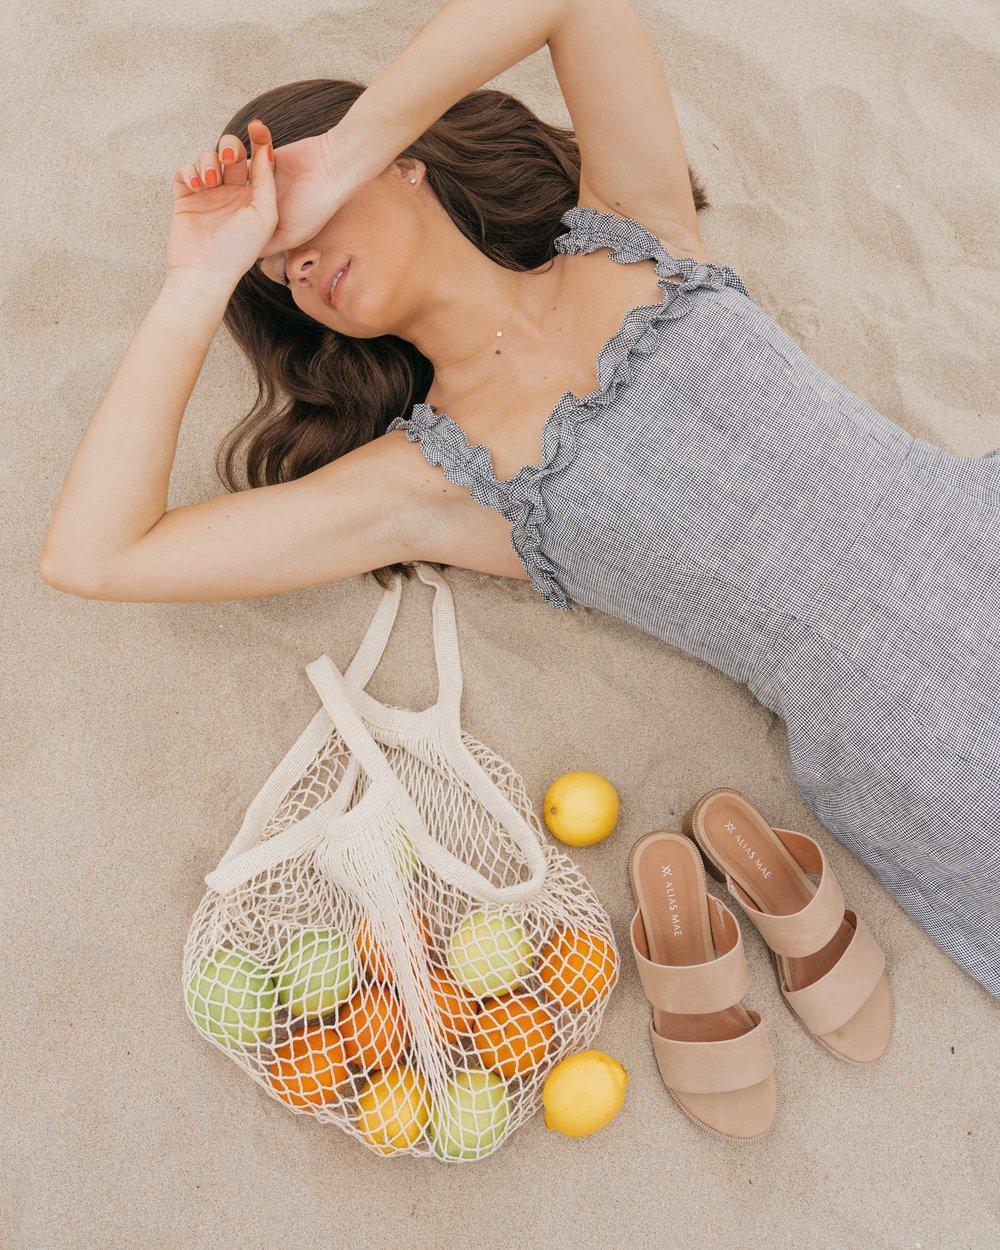 Reformation Lavendar Midi Dress Cotton Net Shopping Tote Newport Beach California Summer Outfit3.jpg